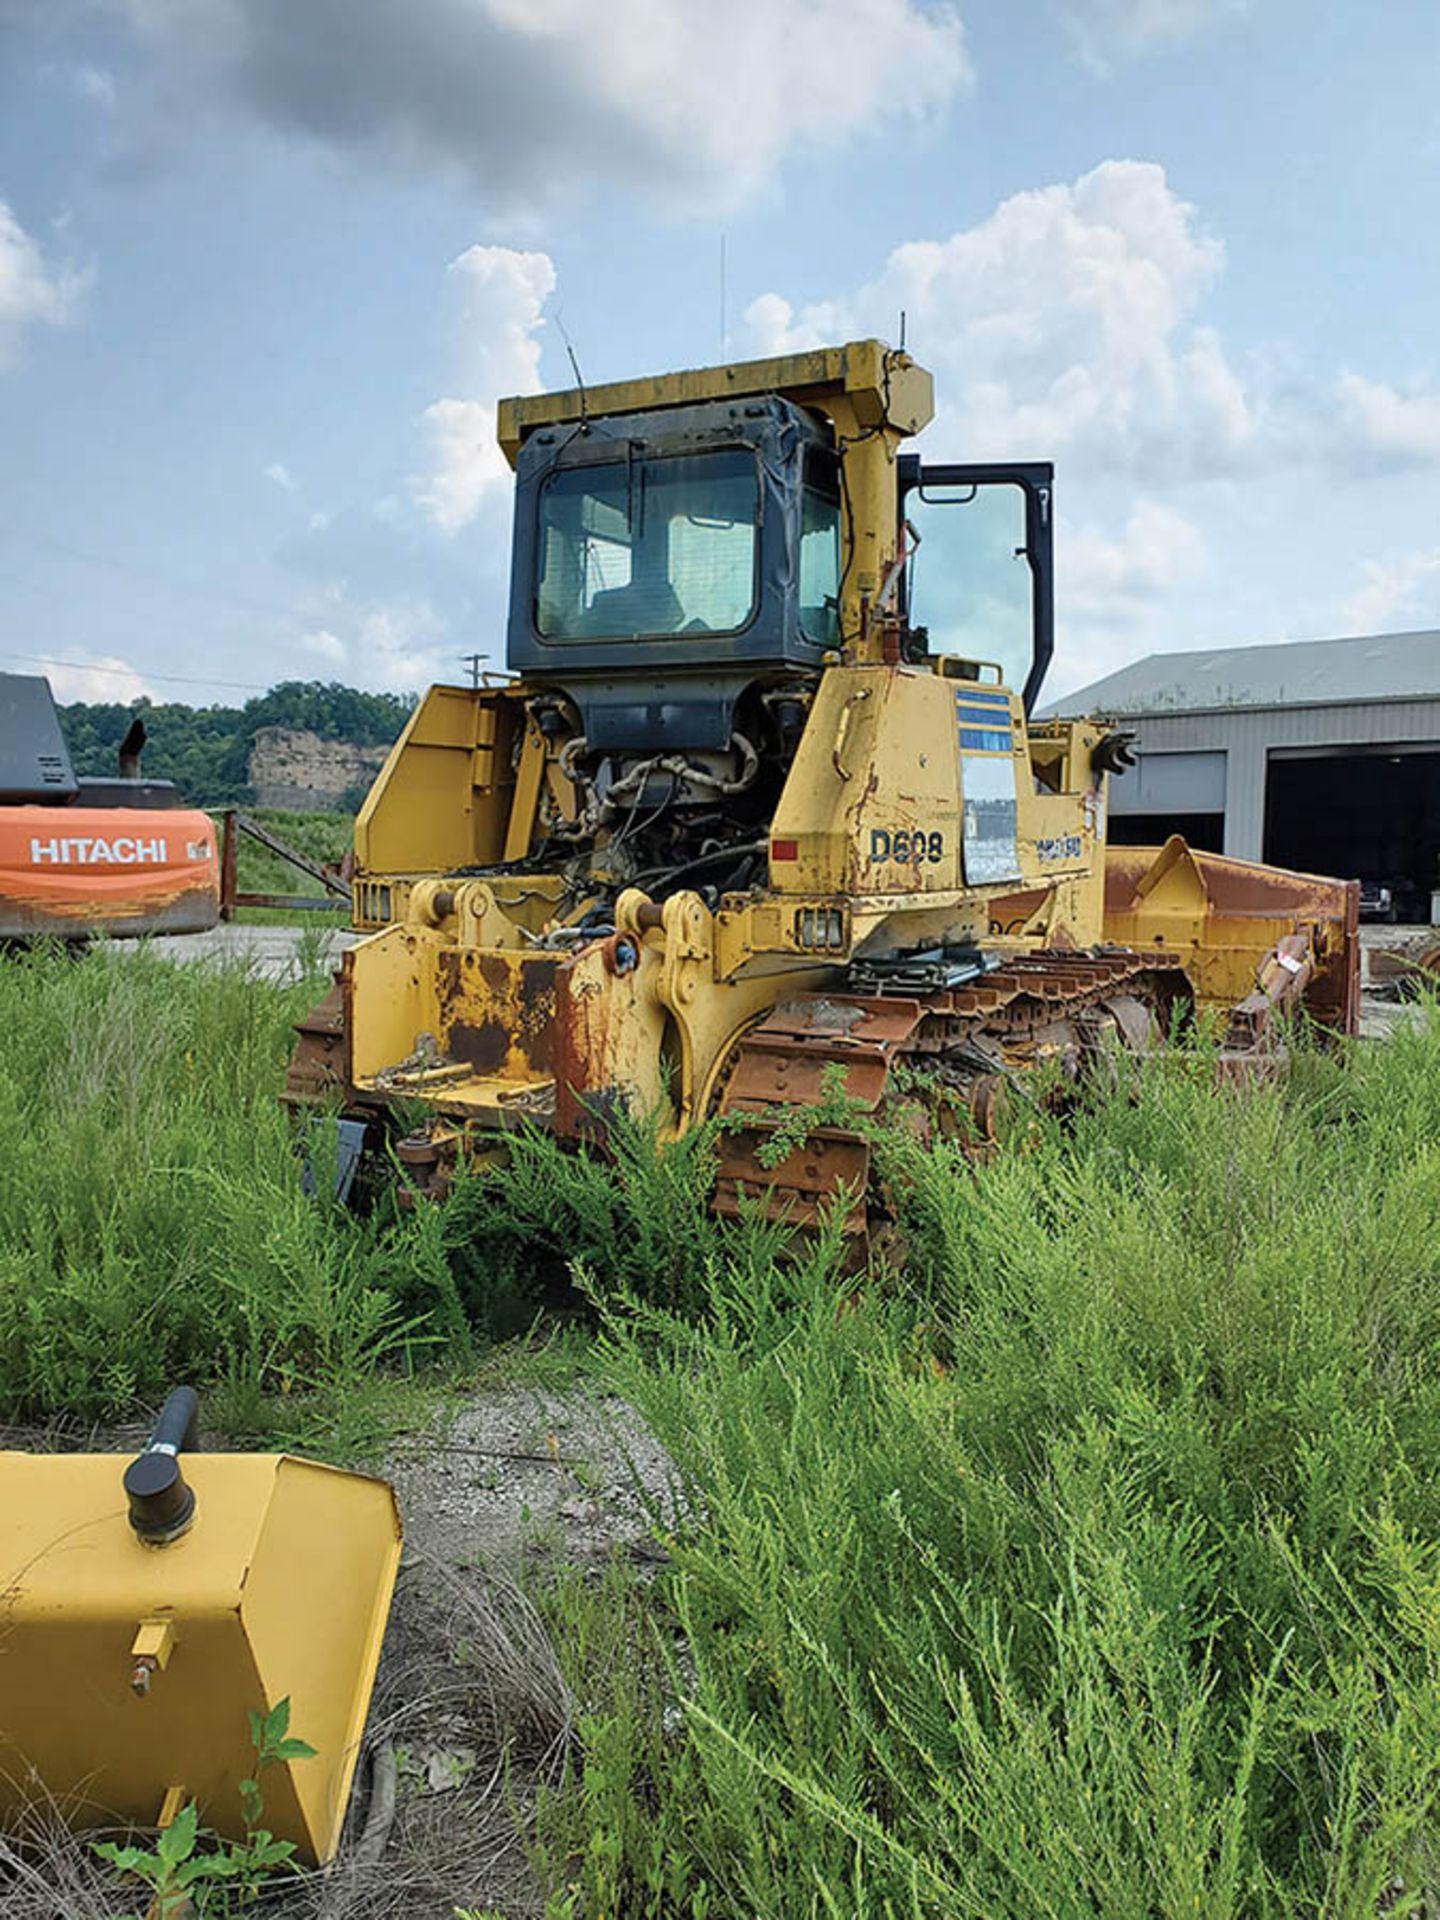 Lot 111 - KOMATSU D 275SX DOZER, S/N: 30118, NO ENGINE, 24'' WIDE METAL TRACKS, 13'6'' WIDE DOZER BLADE, FOR